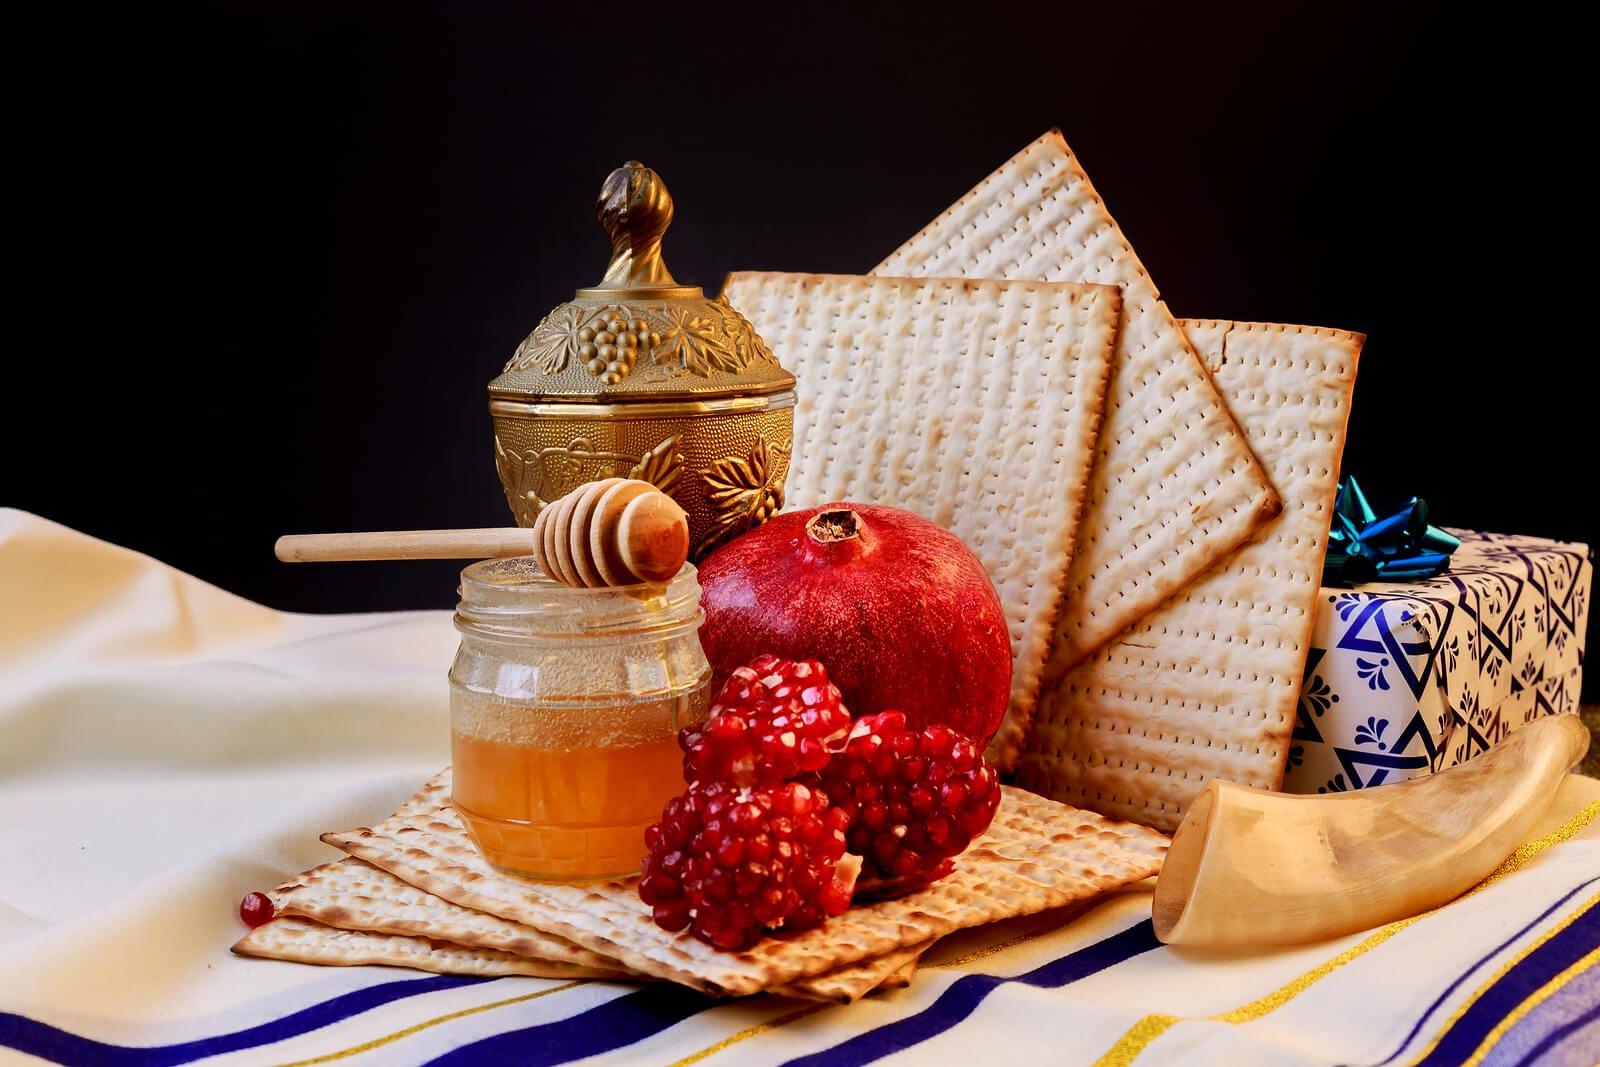 Jewish tradional food